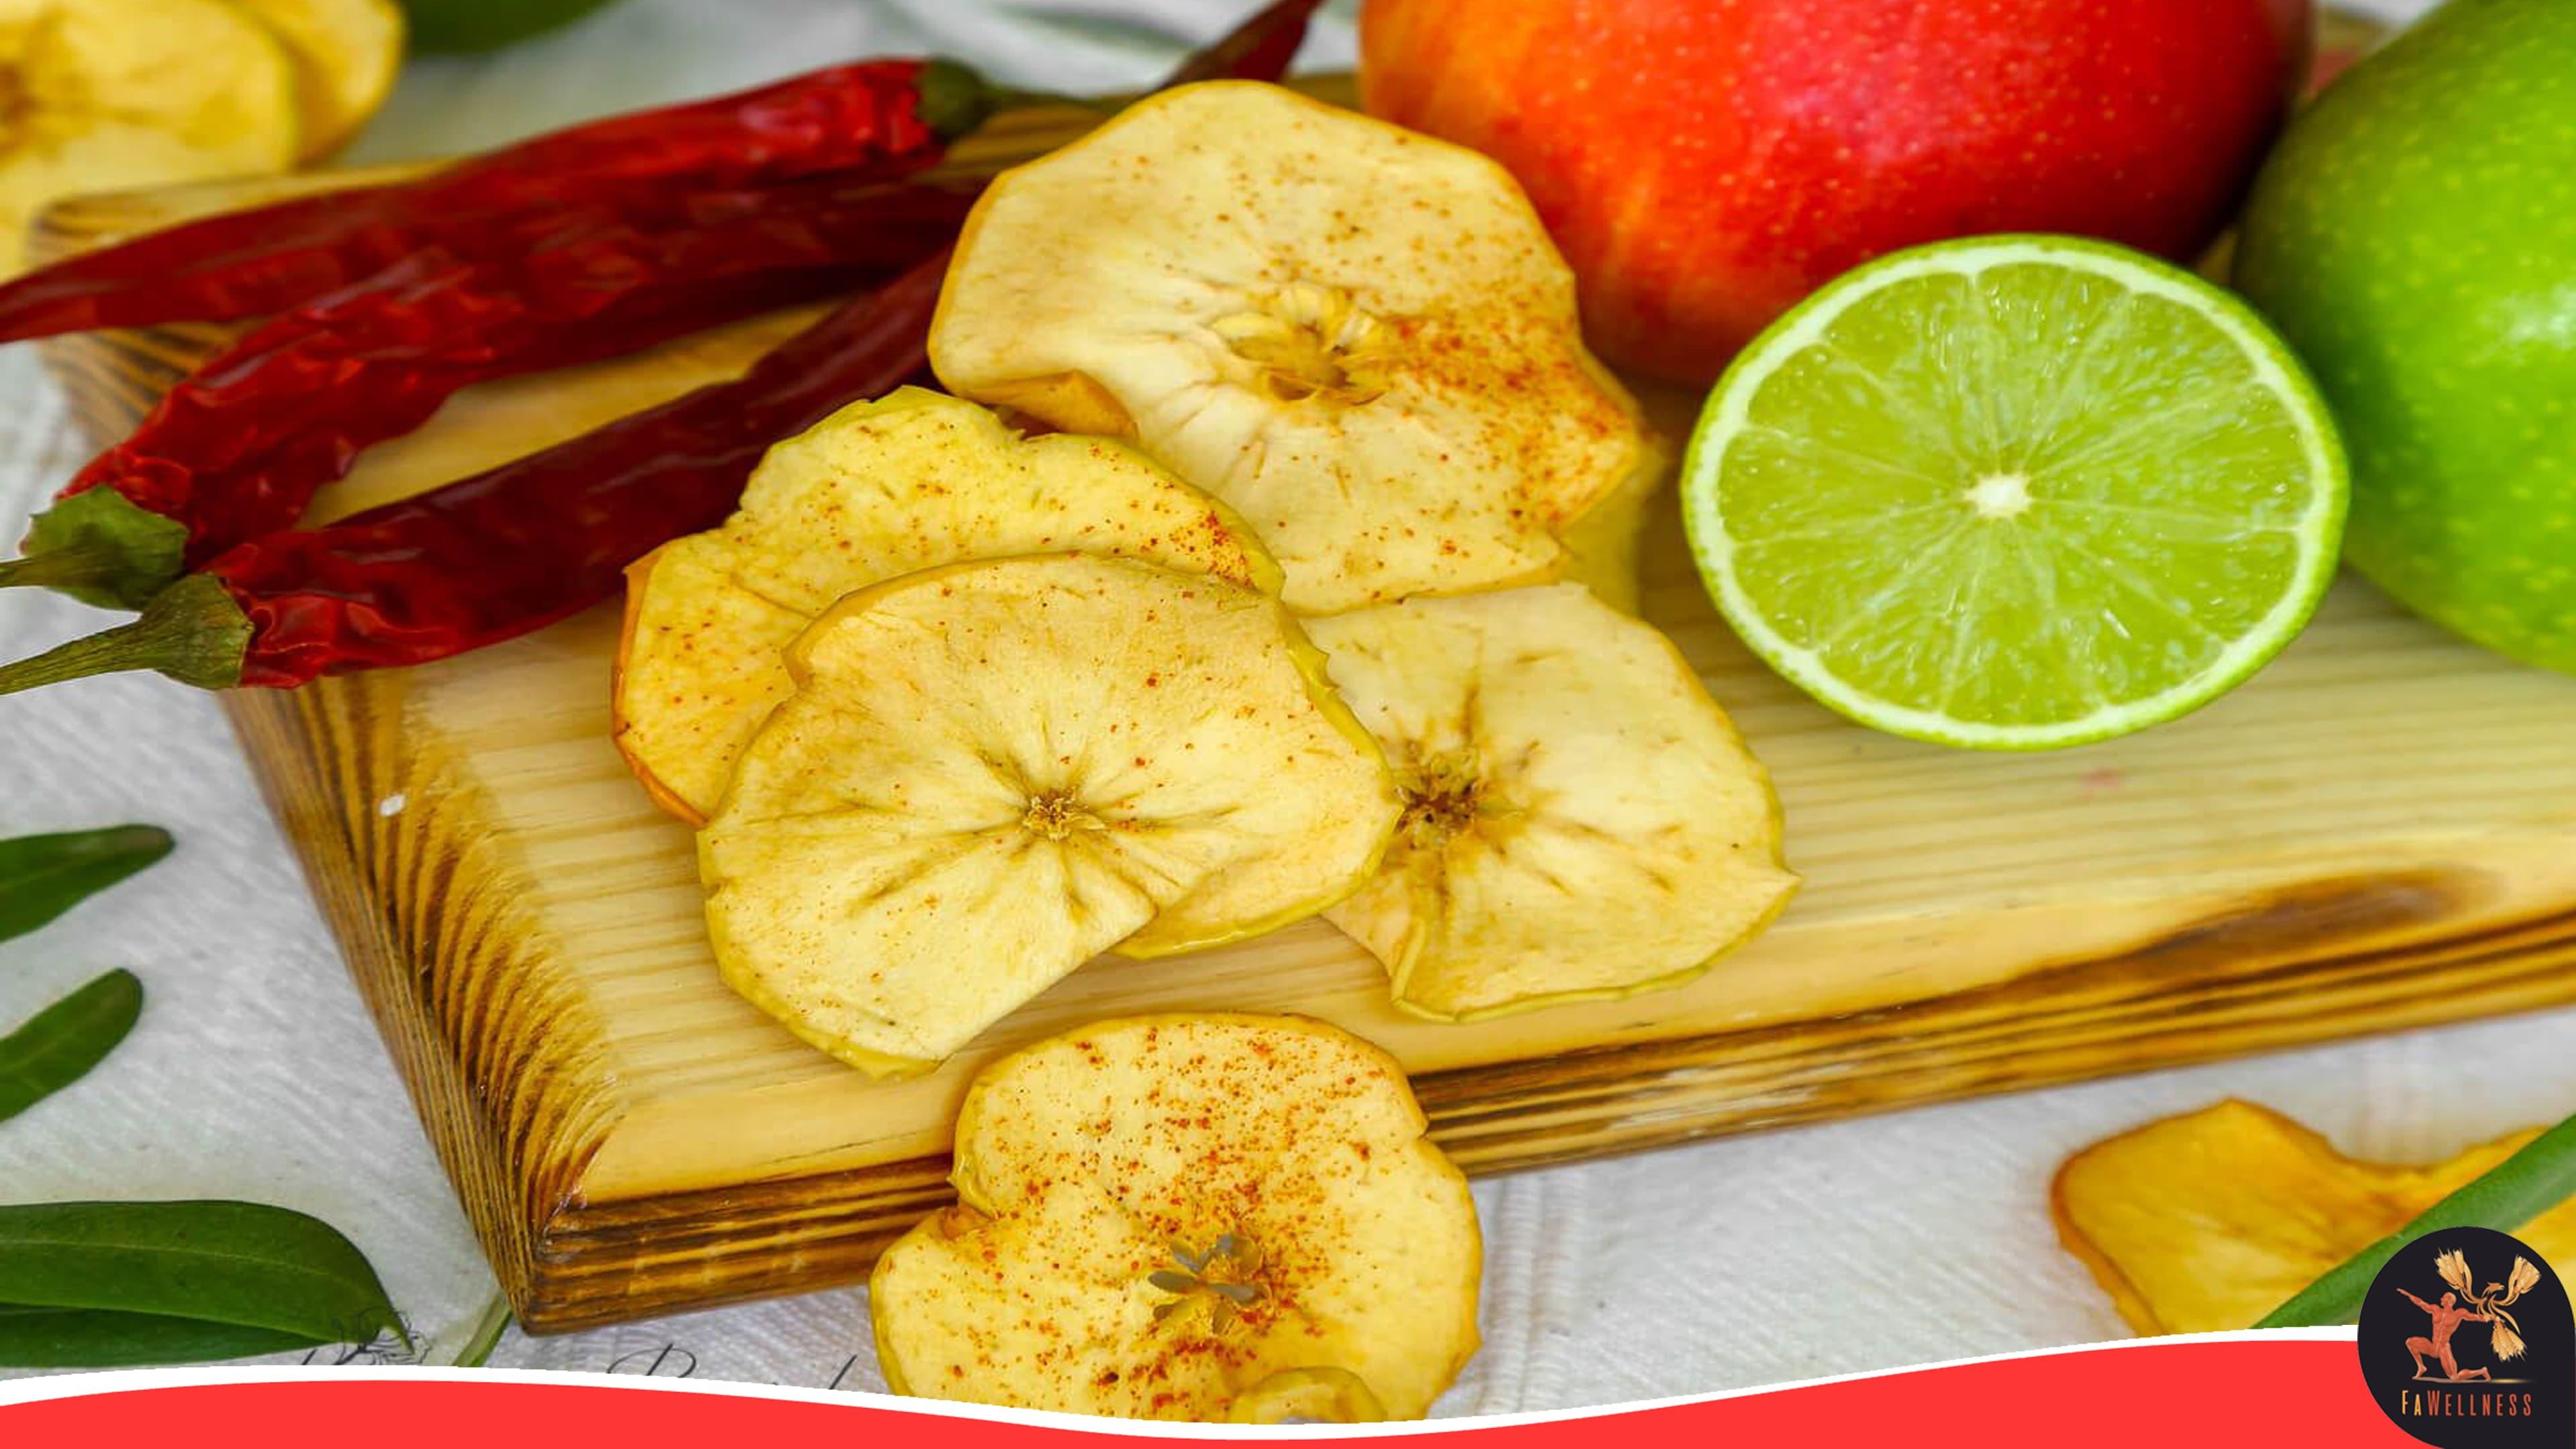 imagen blog FaWellness | Snack de manzana con canela